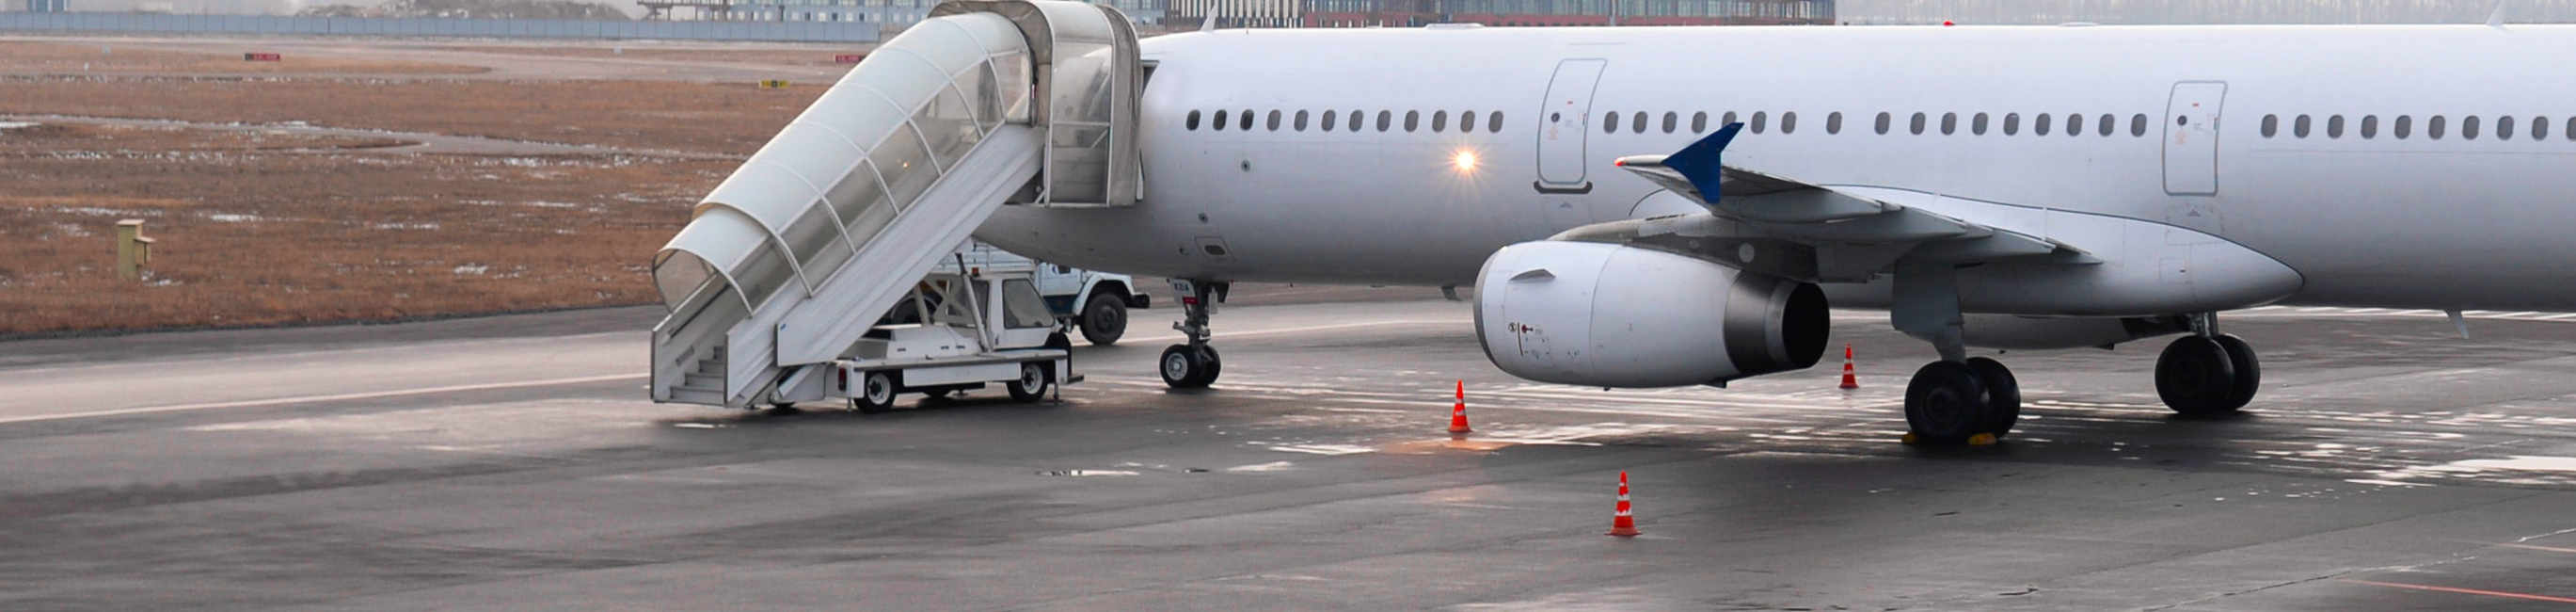 Lennutranspordi jälgimine